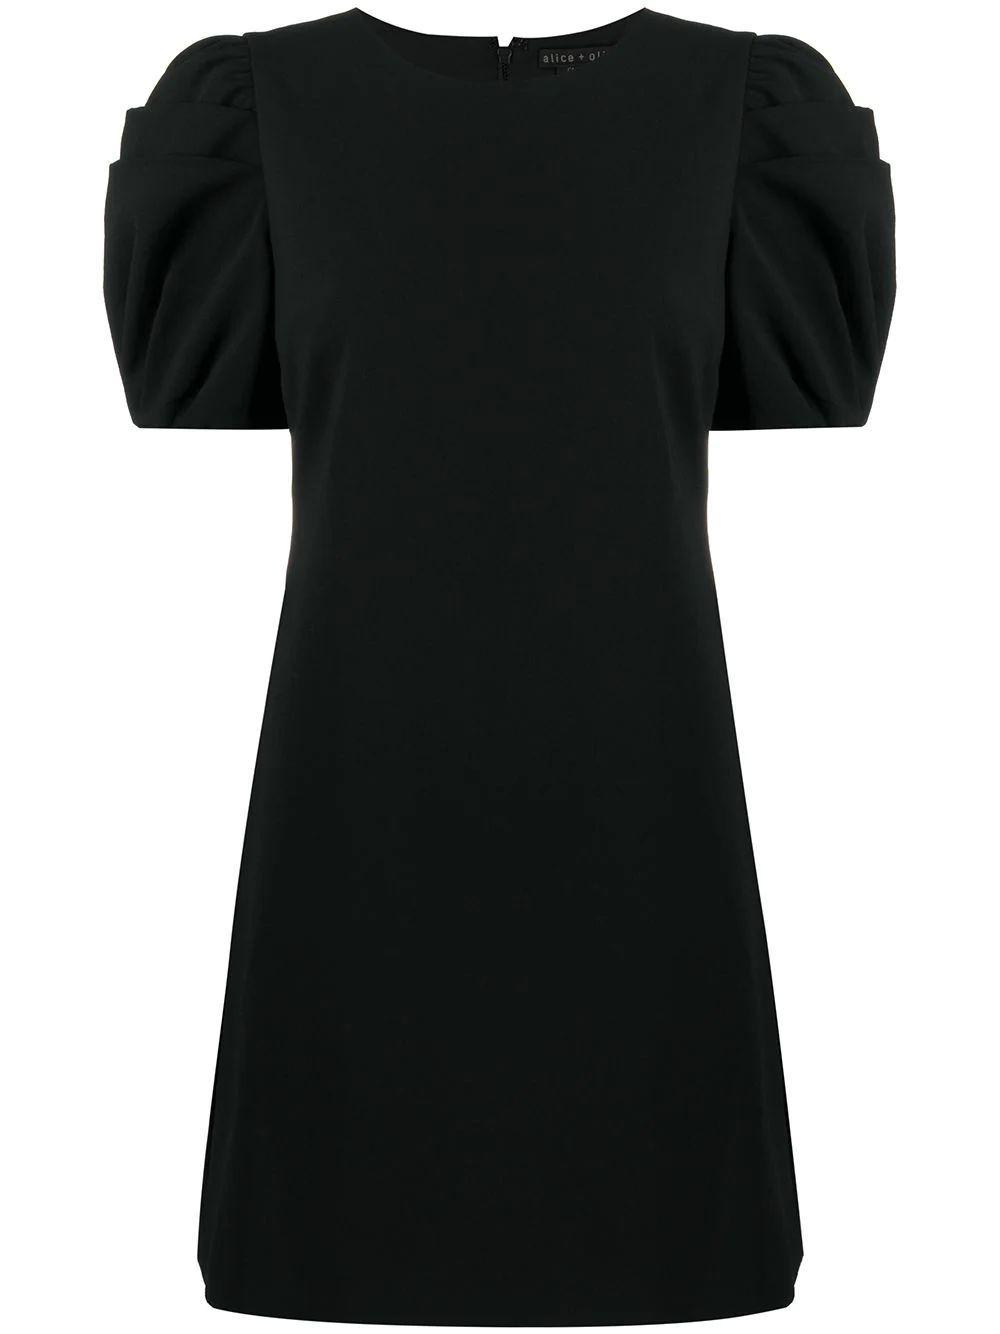 Hanita Puff Sleeve Shirt Dress Item # CL000202517